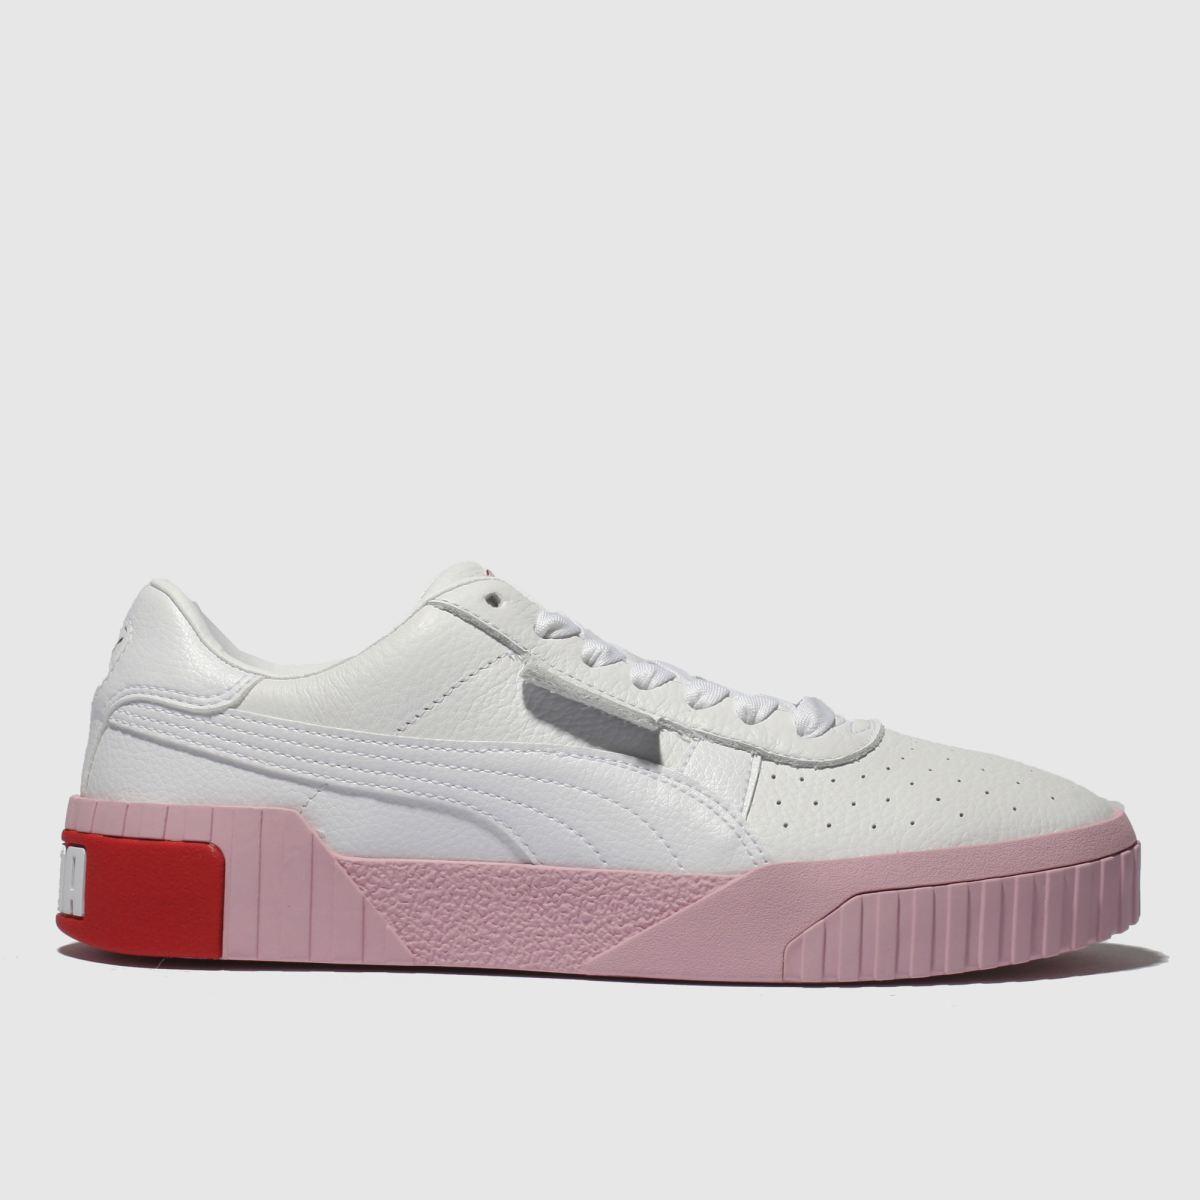 Puma White & Pink Cali Leather Trainers